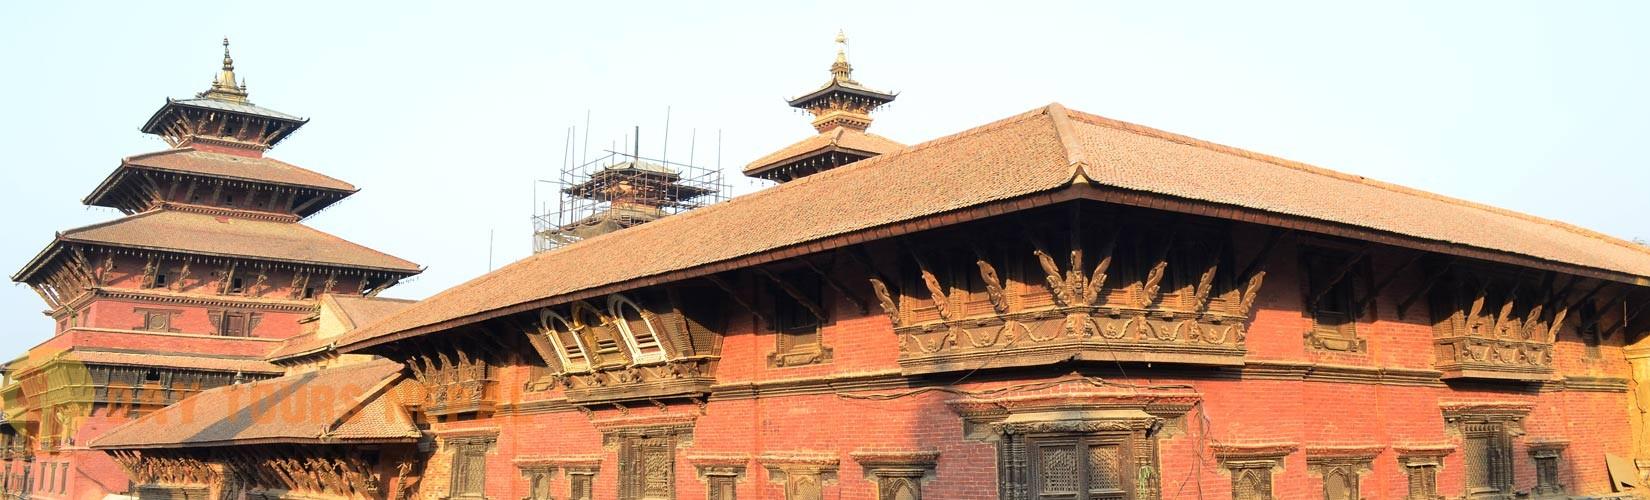 Nepal Scenic 6 days tour Nepal